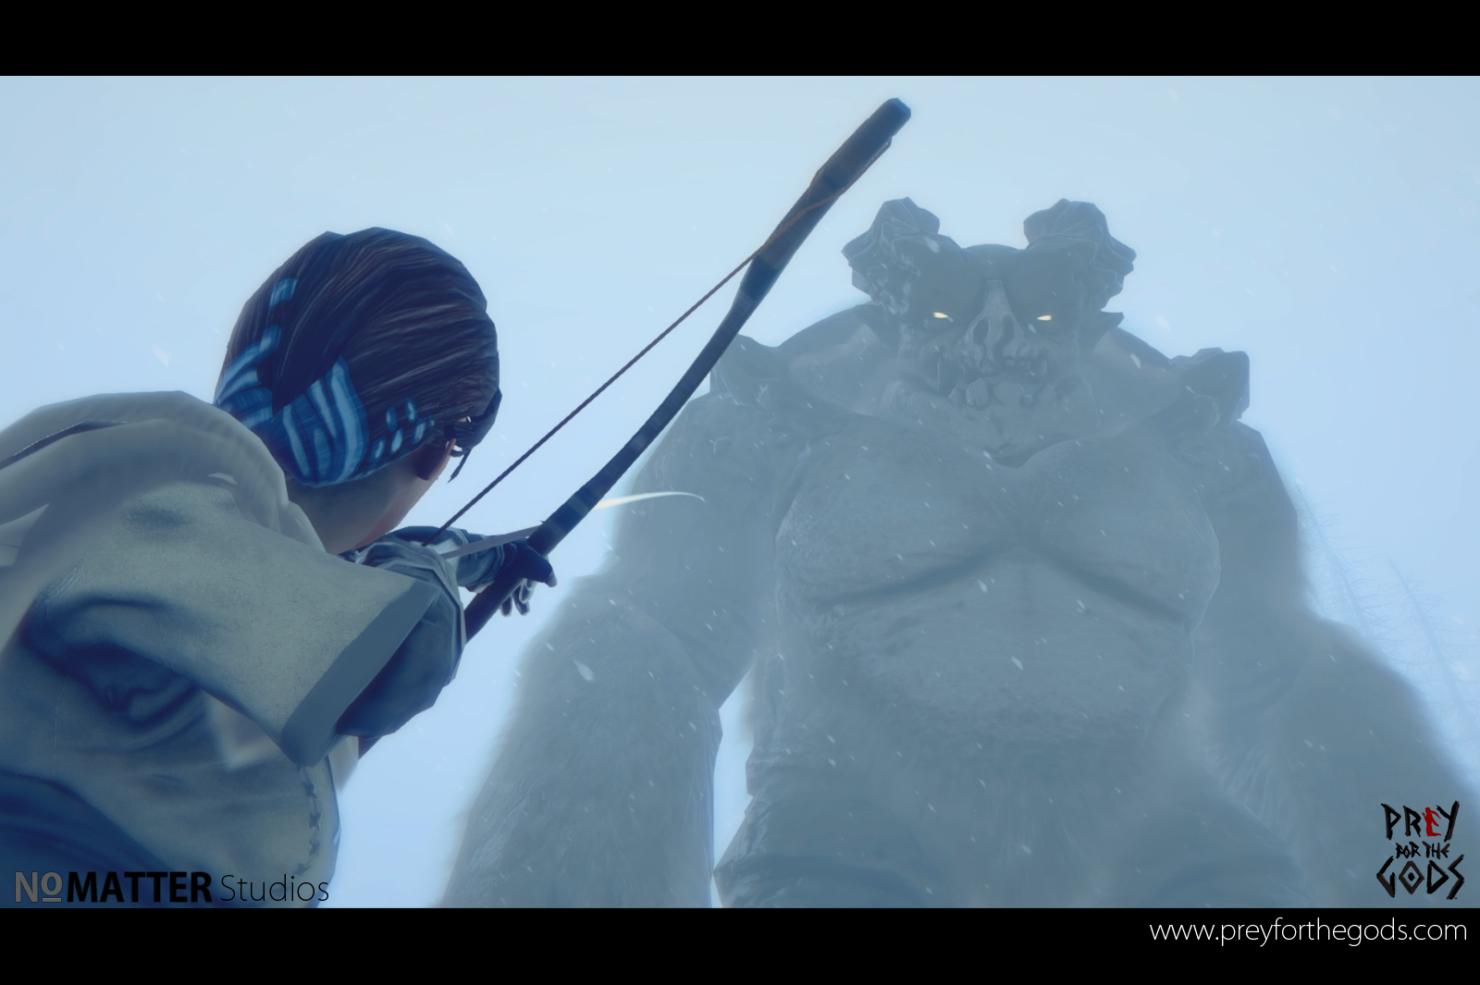 prey-for-the-gods-10